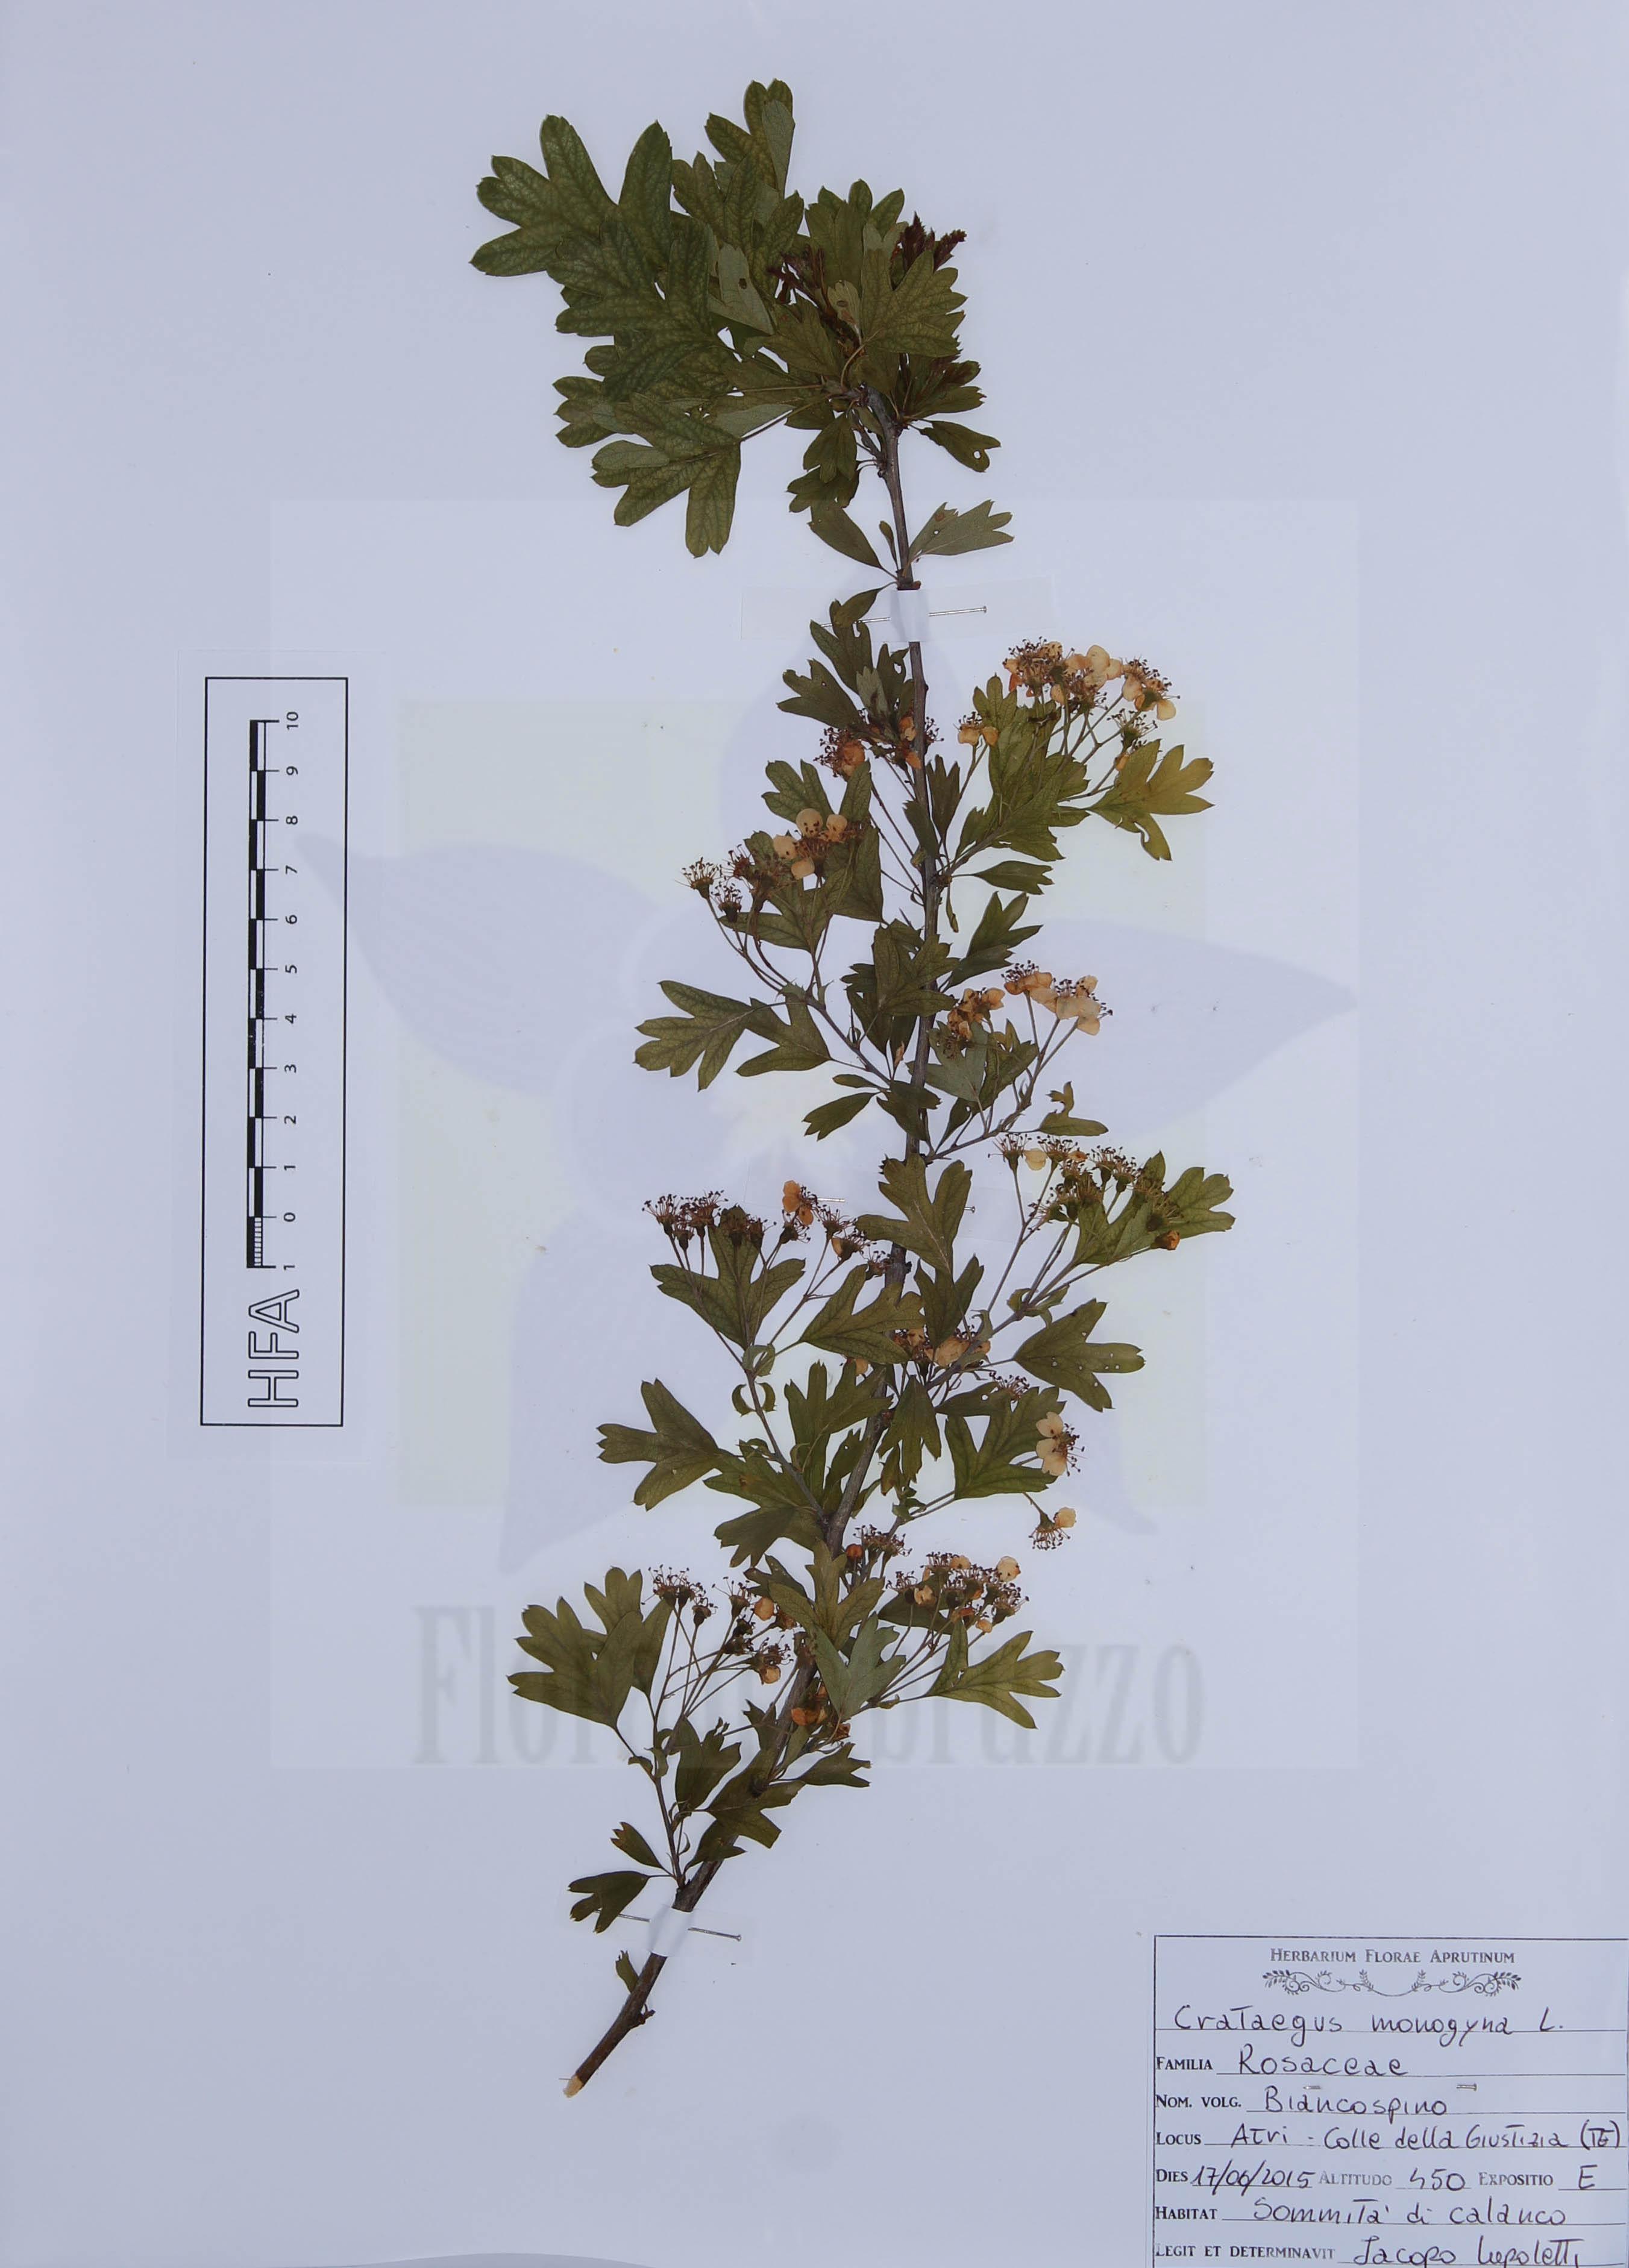 Crataegus monogyna L.